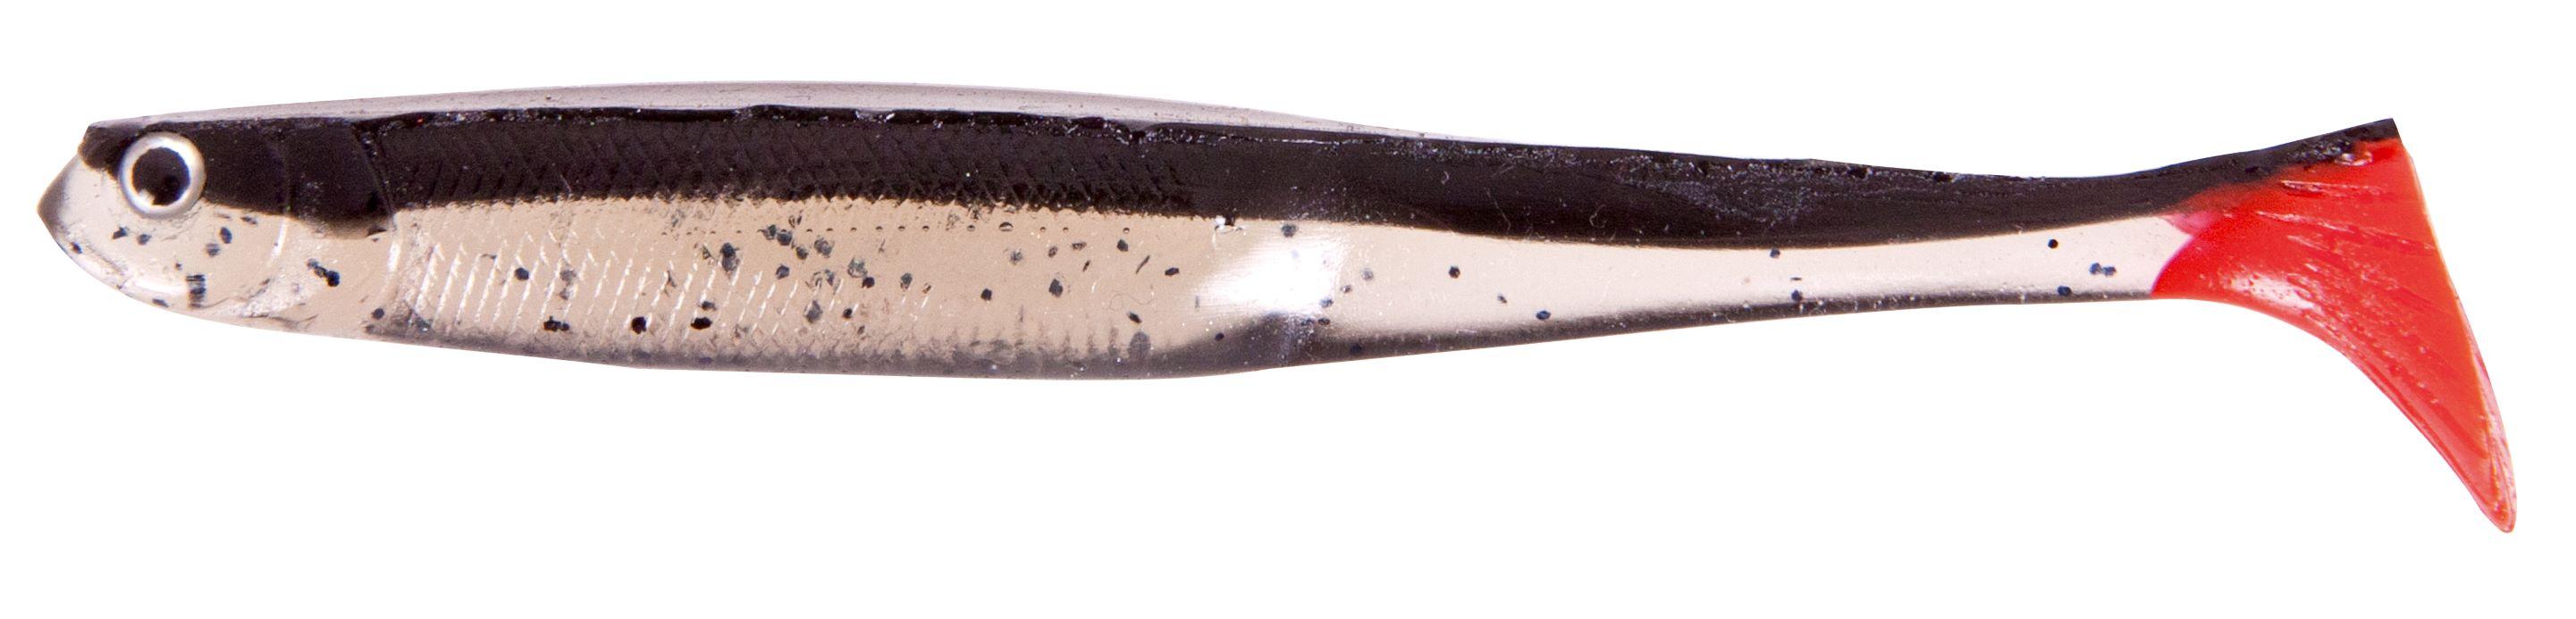 Iron Claw gumová nástraha Slim Jim 7 cm Vzor CB, 3ks